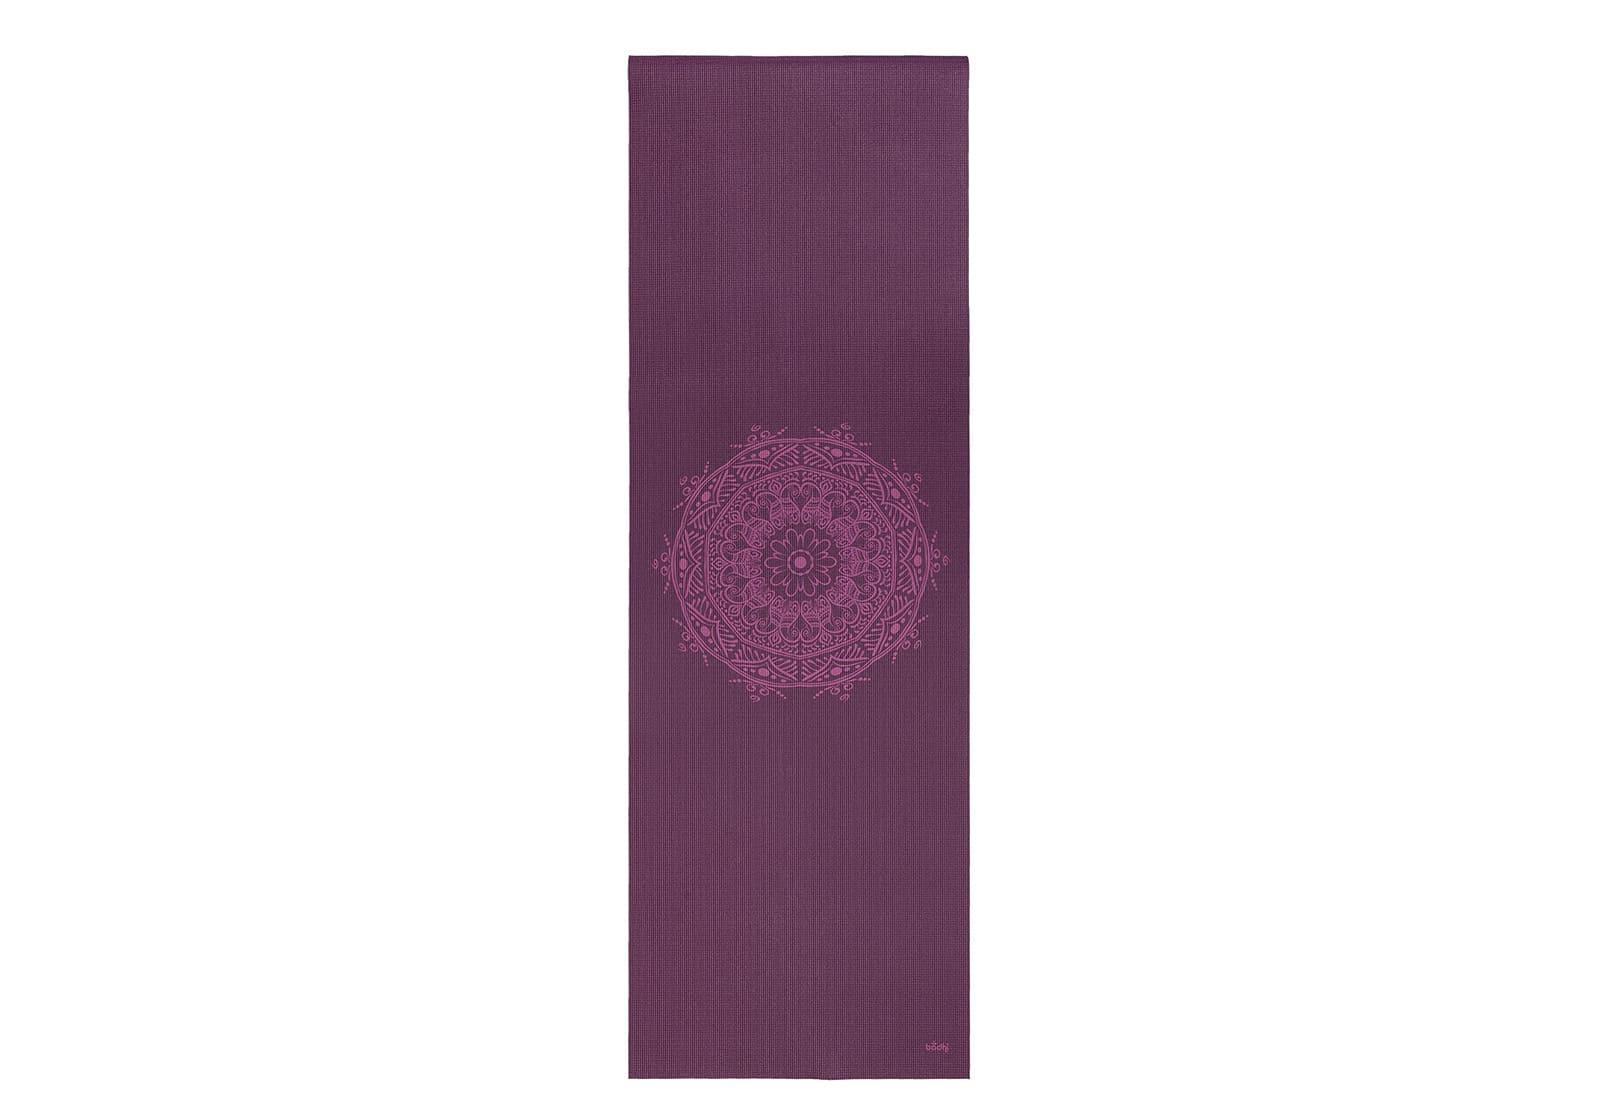 Design-yoga-mat-Leela-Collection-Mandala-aubergine.jpg